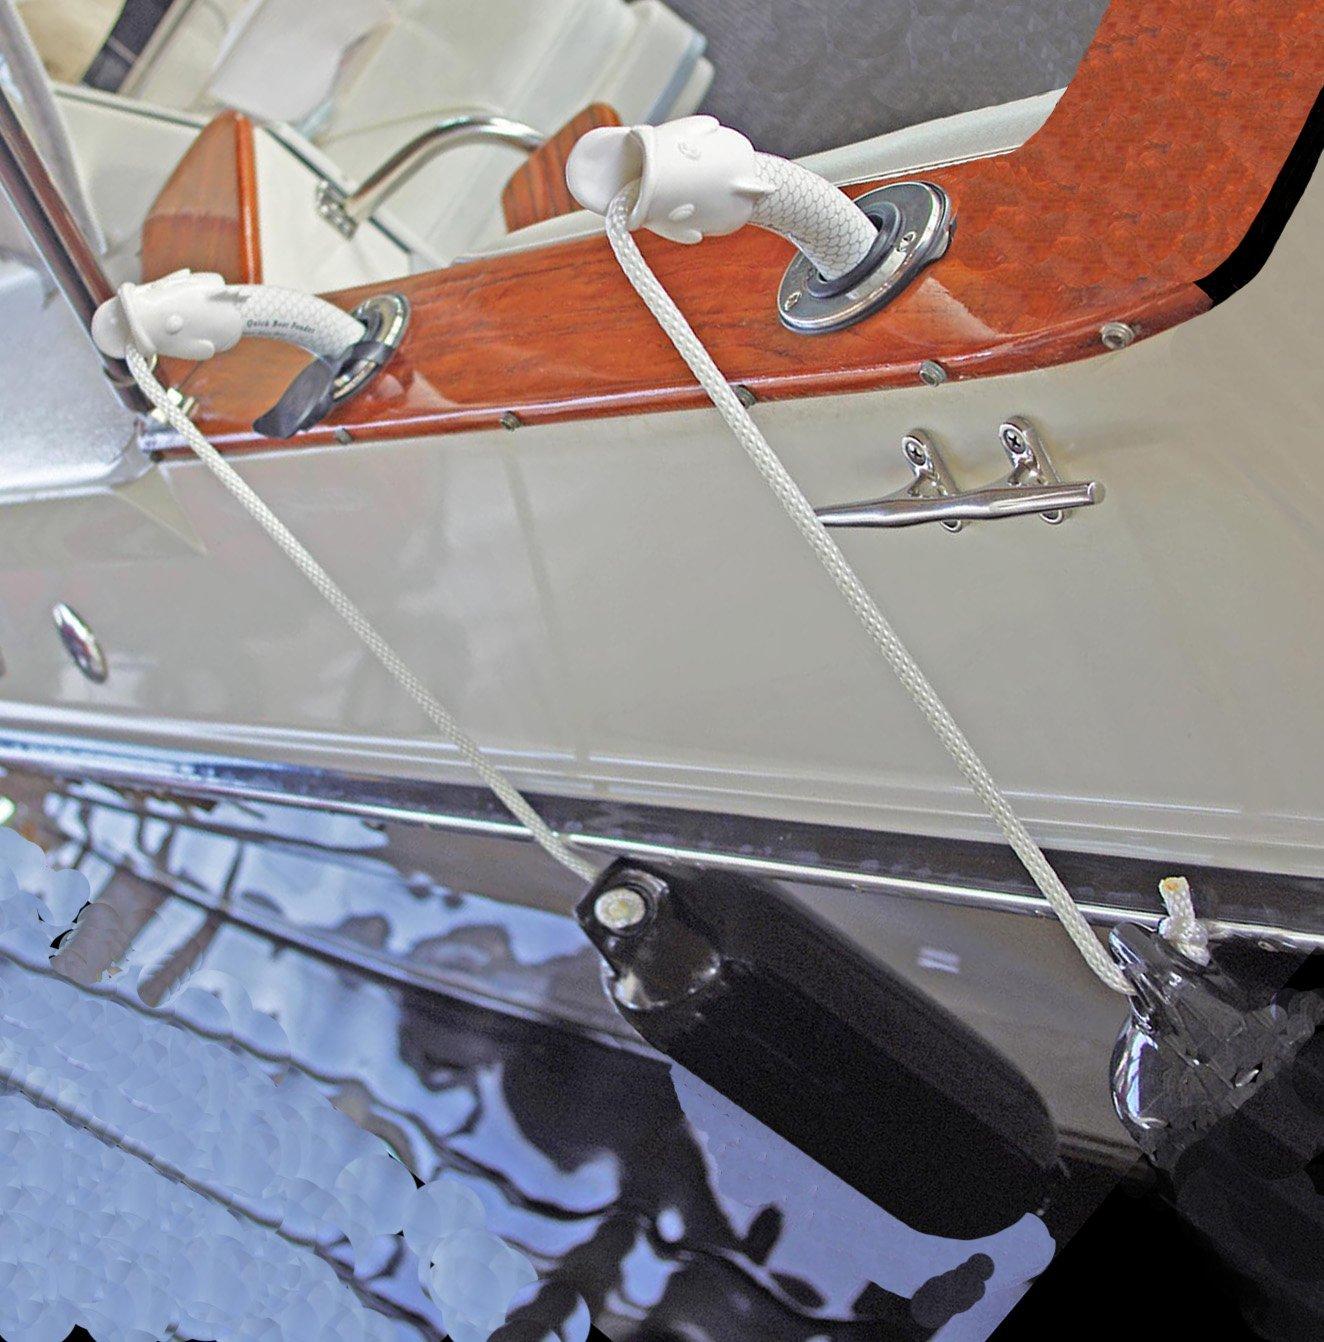 LIFETIME WTY! 6 FENDERGRIP® Fender Holder Adjuster Hanger for Boats The Best